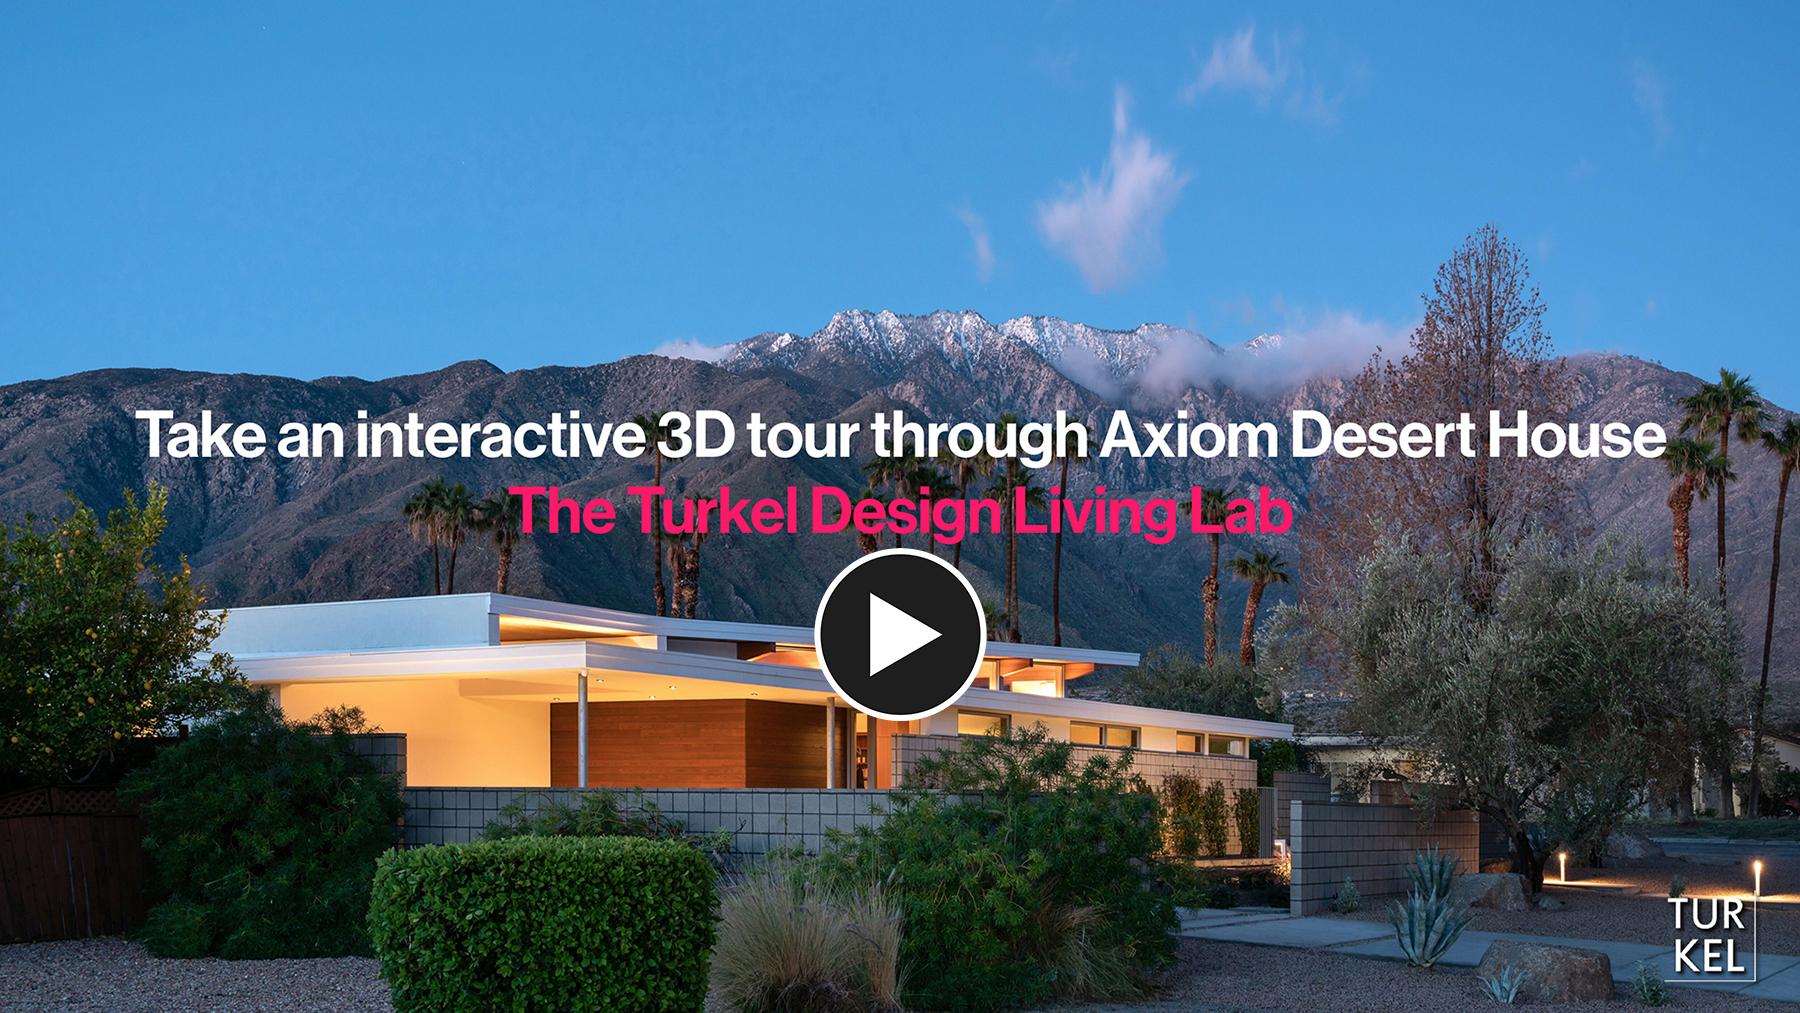 turkel_design_modern_prefab_home_3D_home_tour.jpg